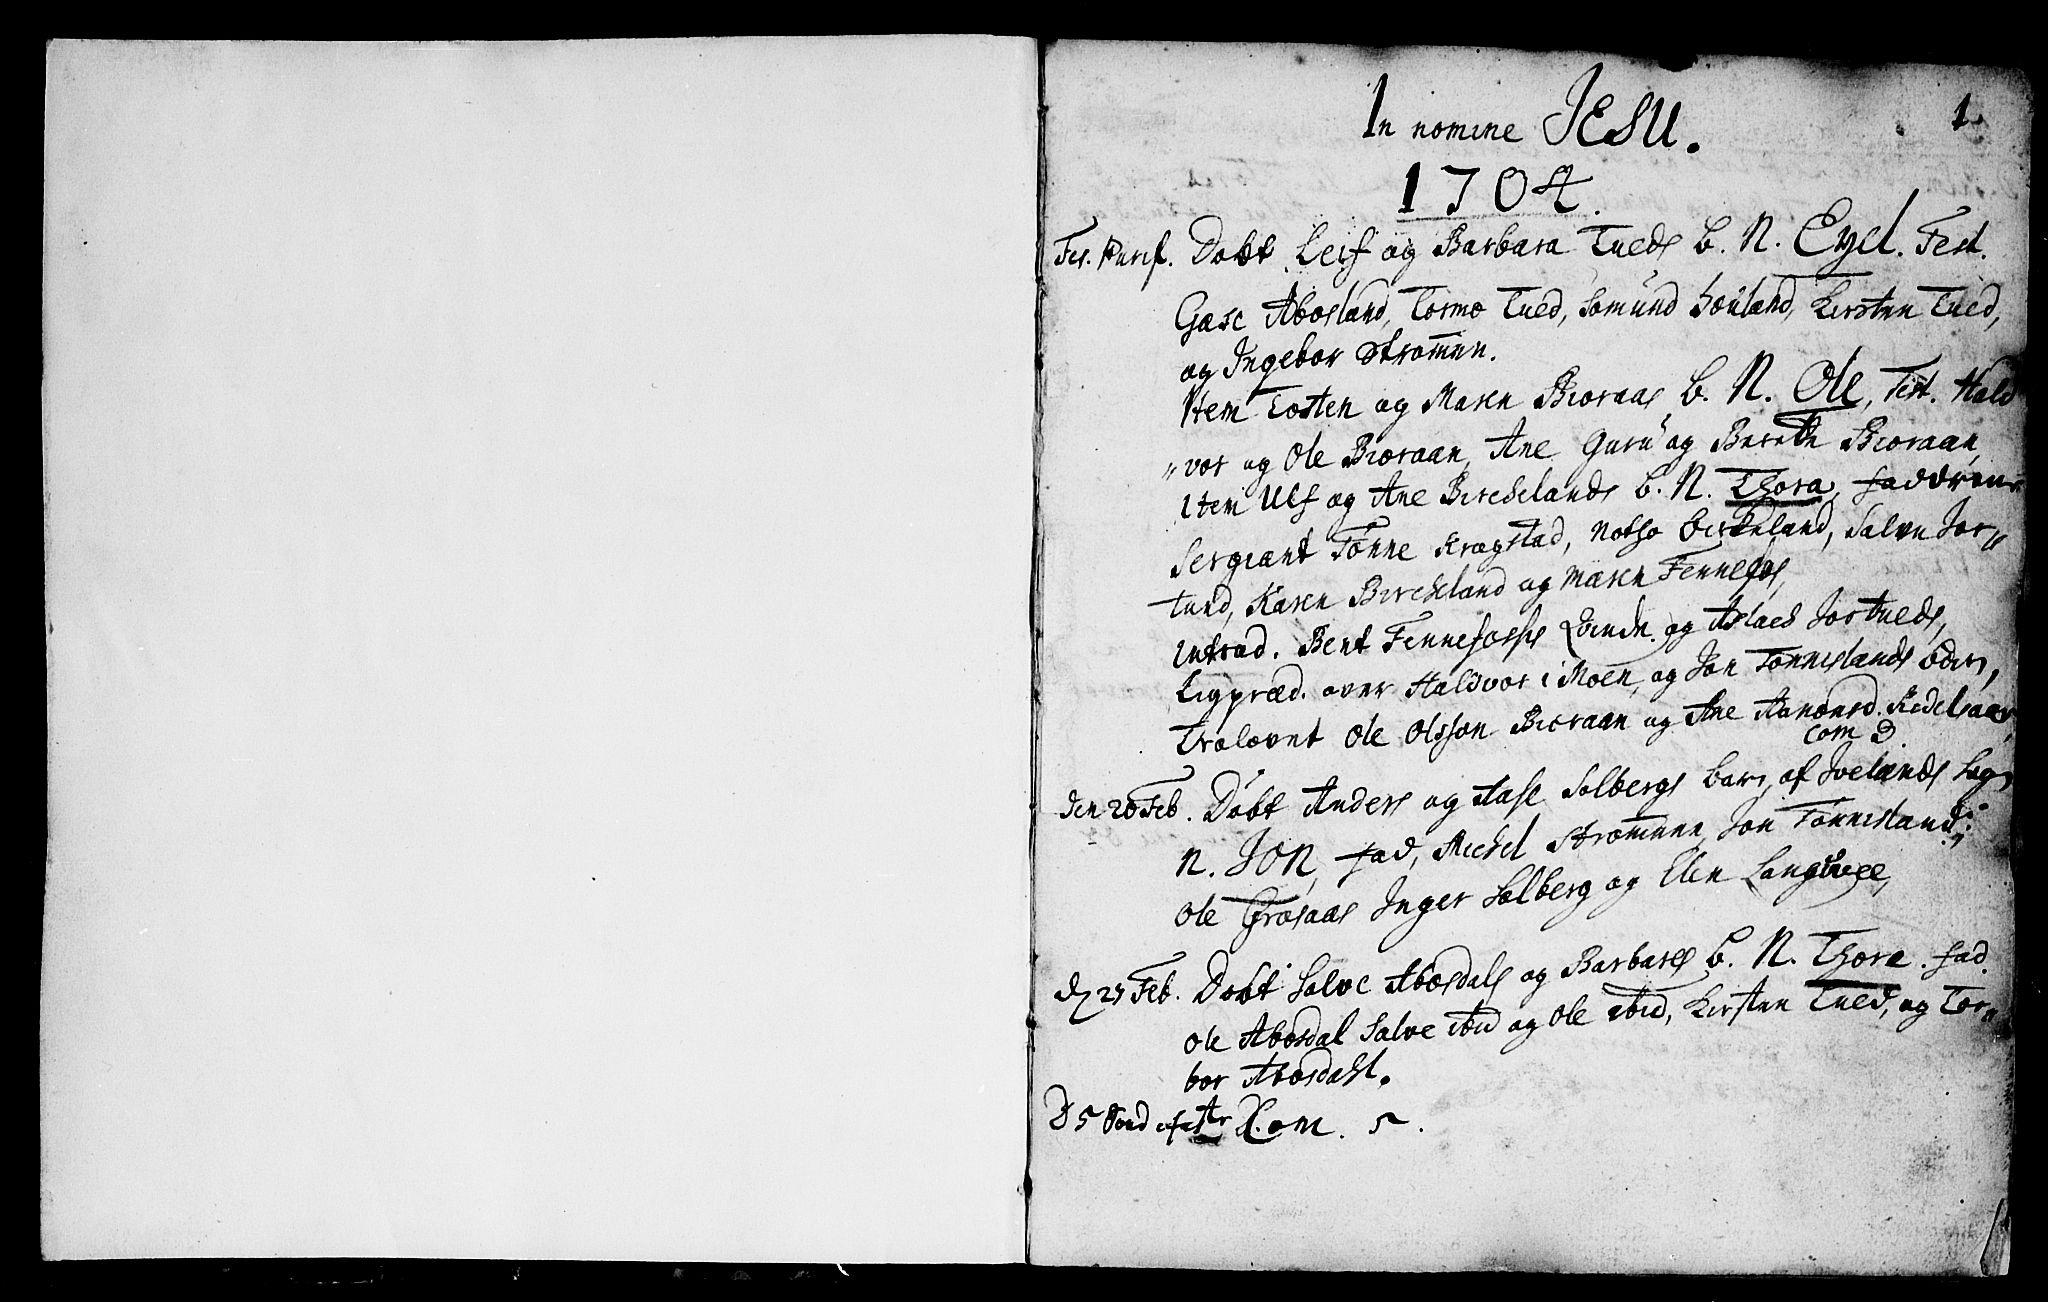 SAK, Evje sokneprestkontor, F/Fa/Fab/L0001: Ministerialbok nr. A 1, 1704-1764, s. 0-1